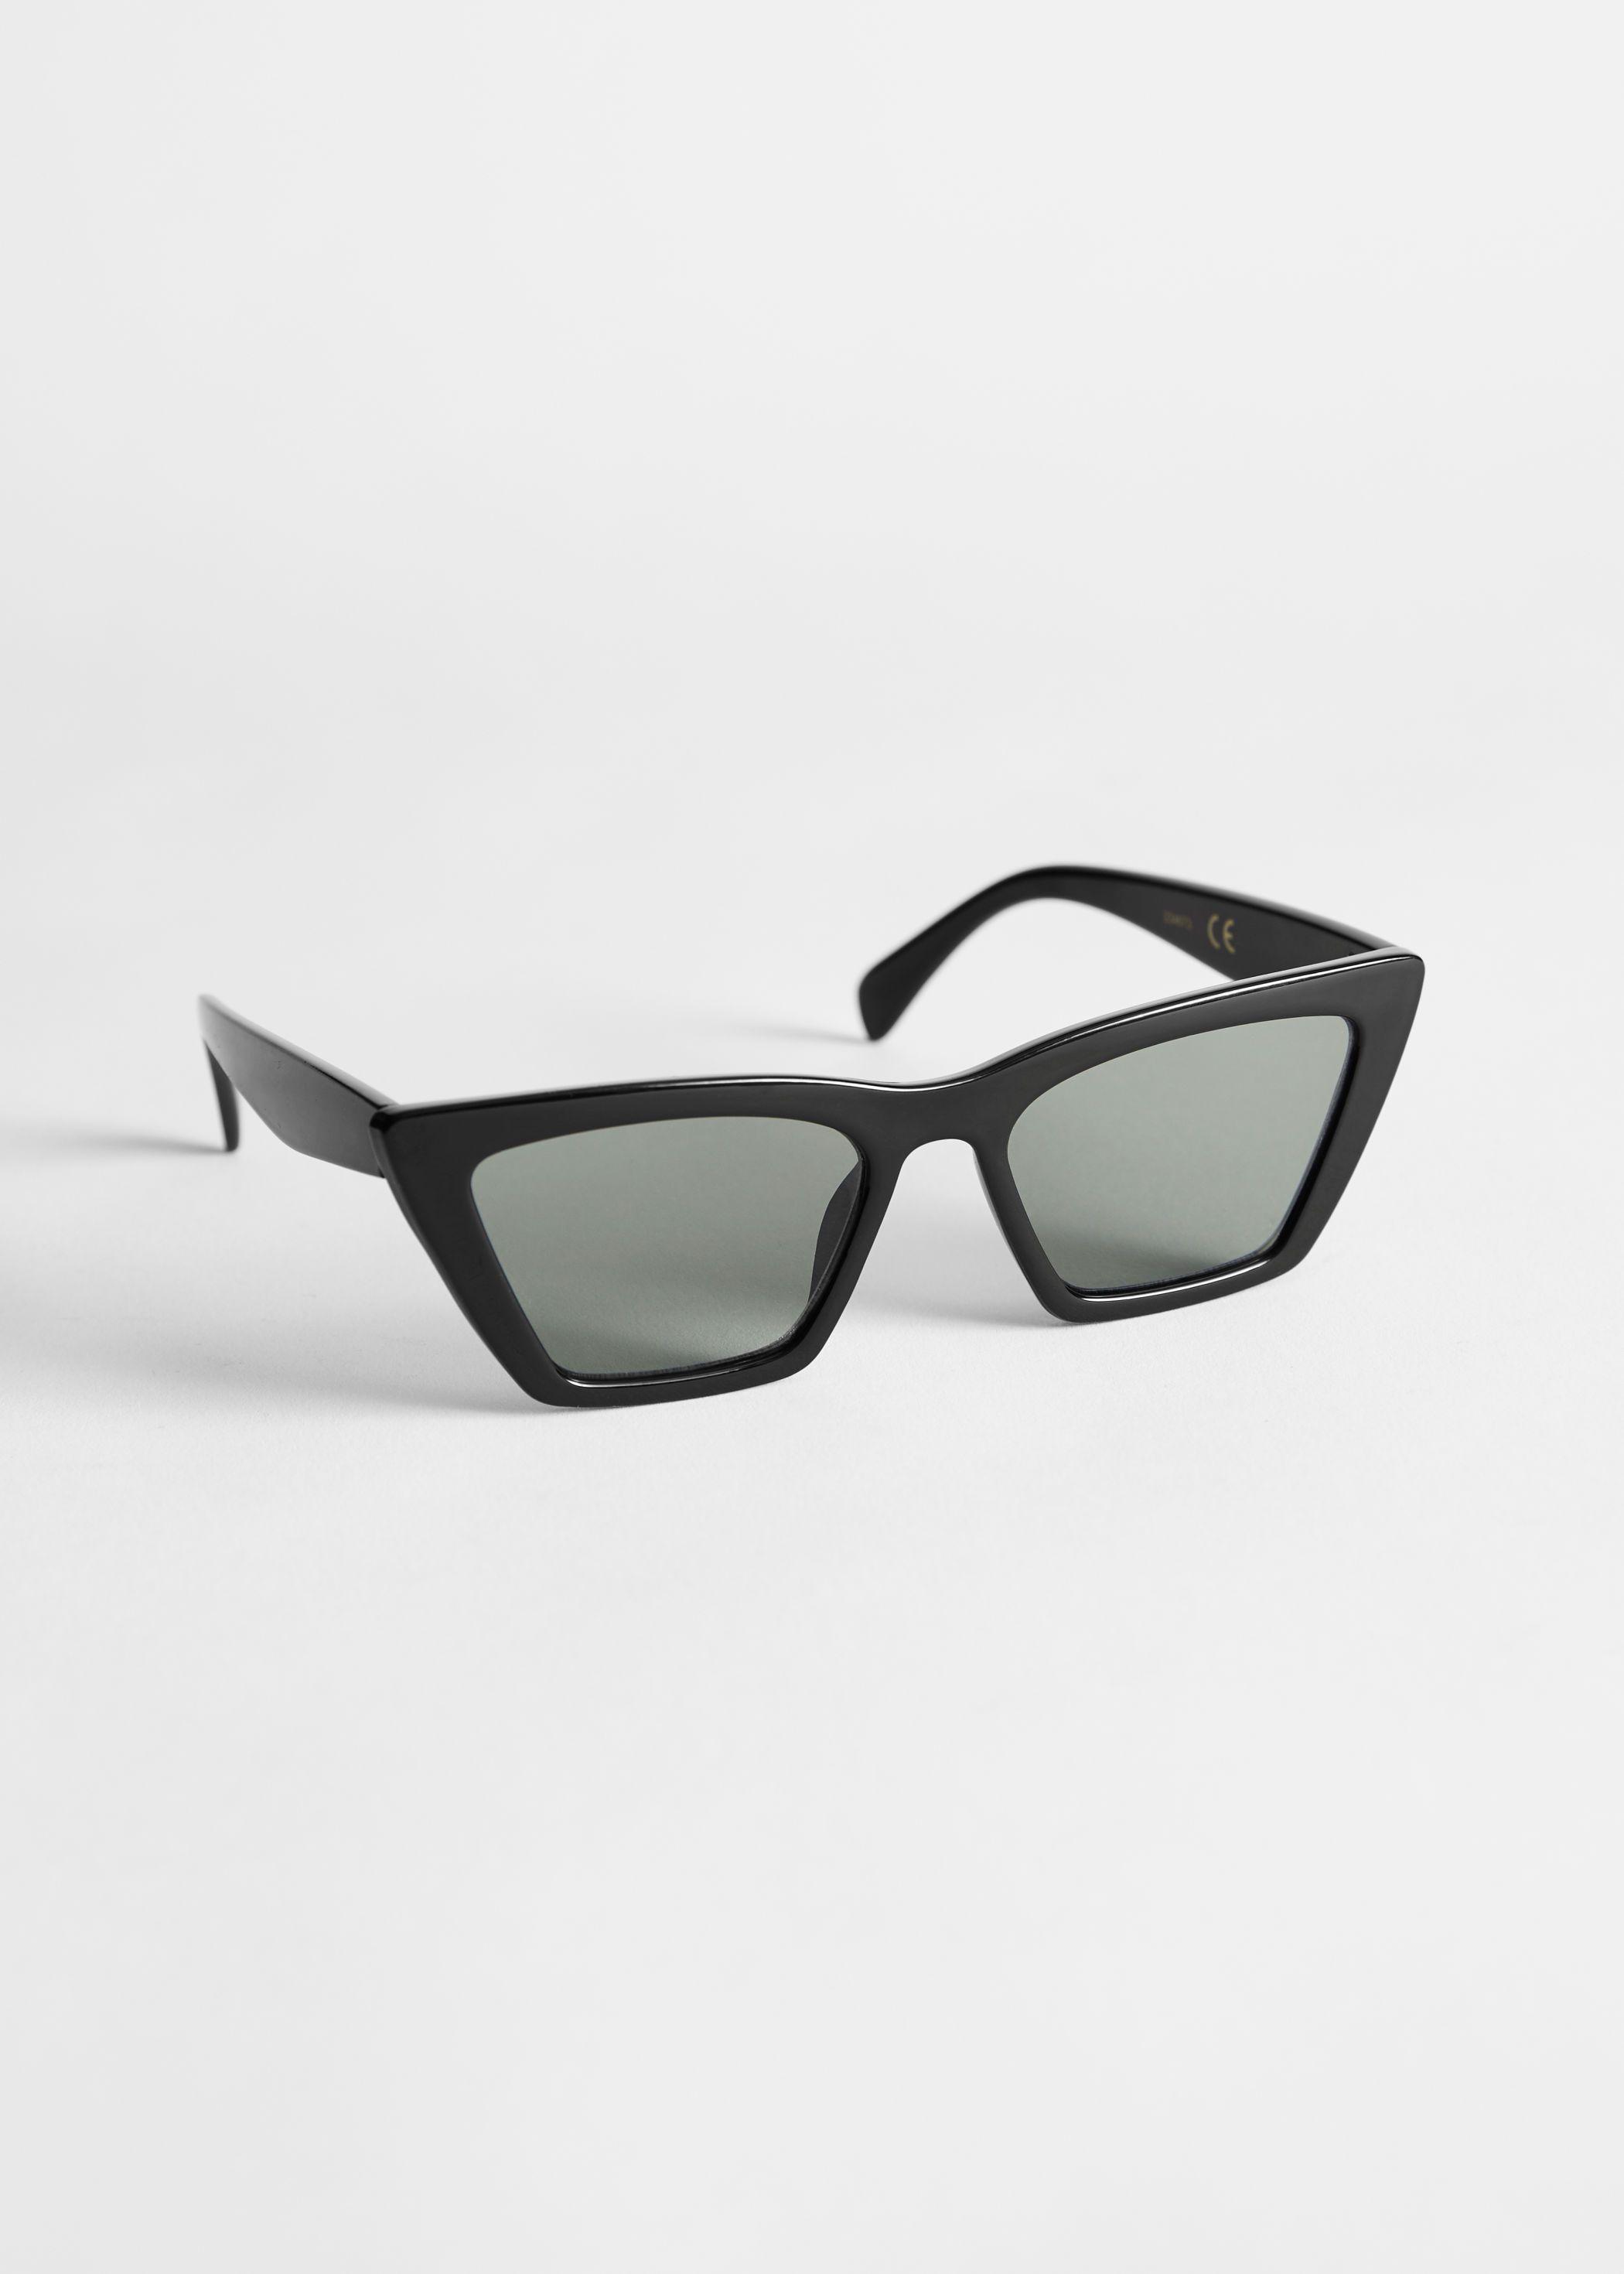 Gafas de sol angulares con ojo de gato